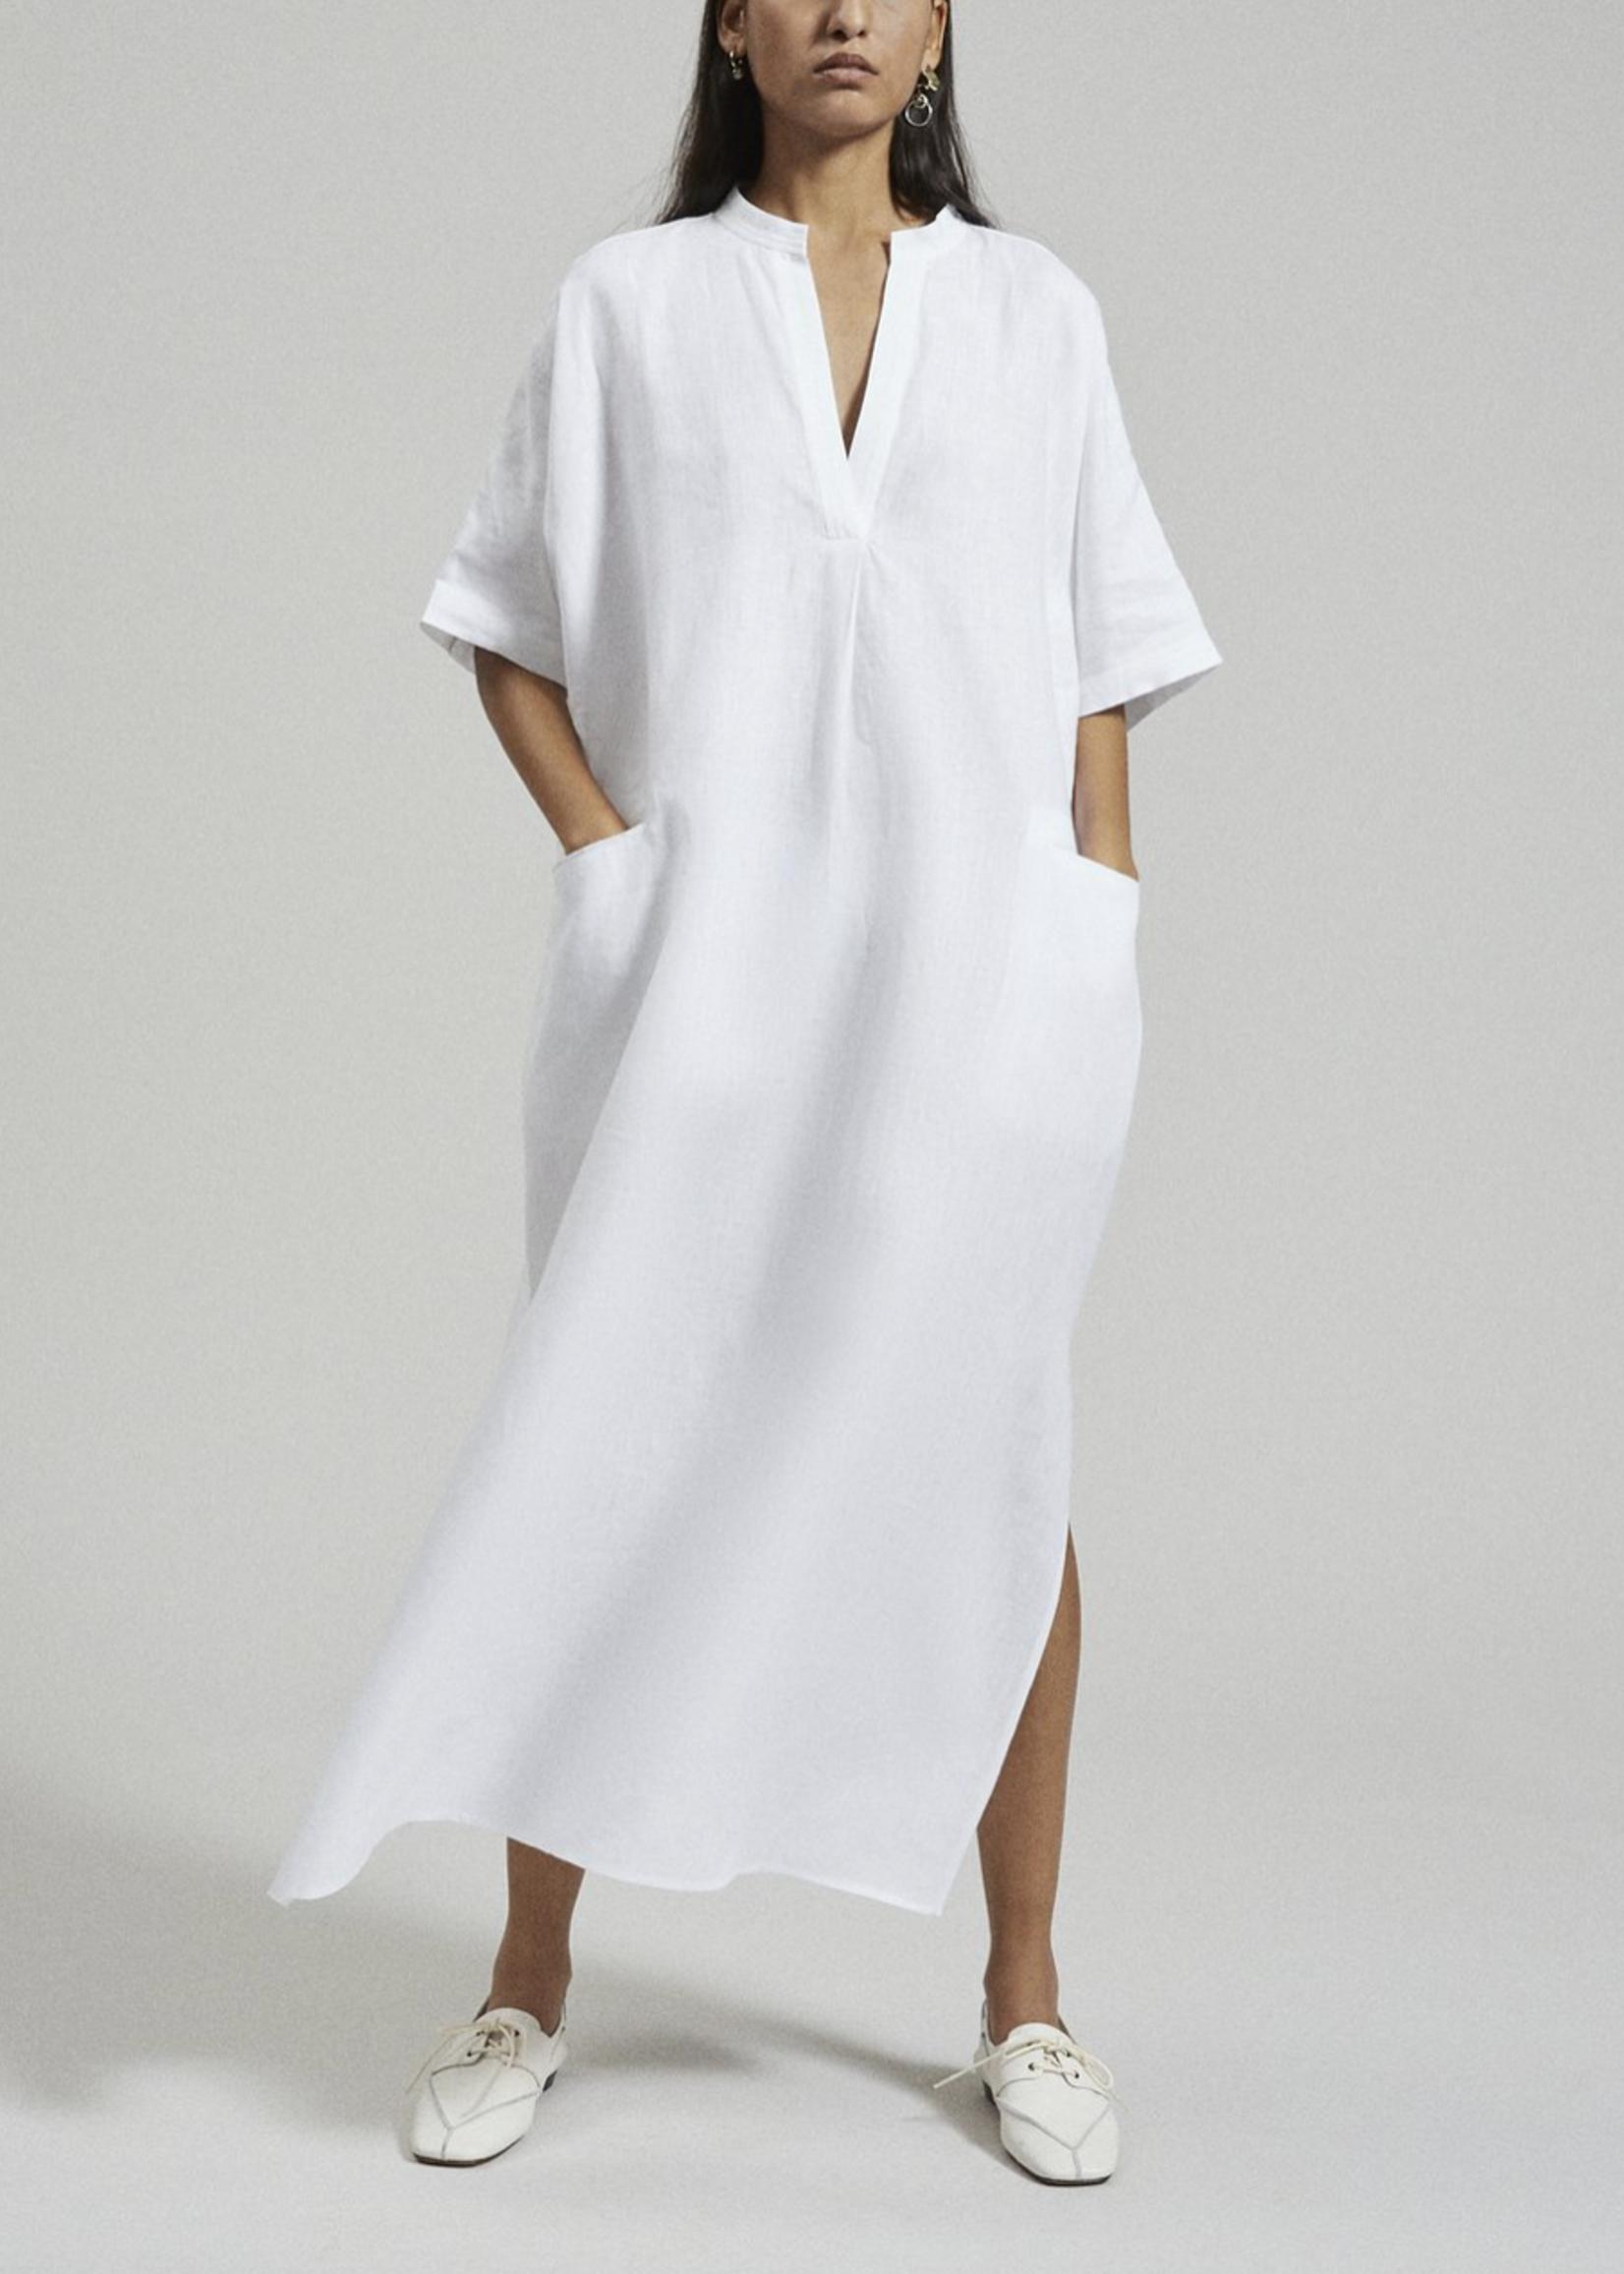 Rachel Comey Culver Linen Dress in White